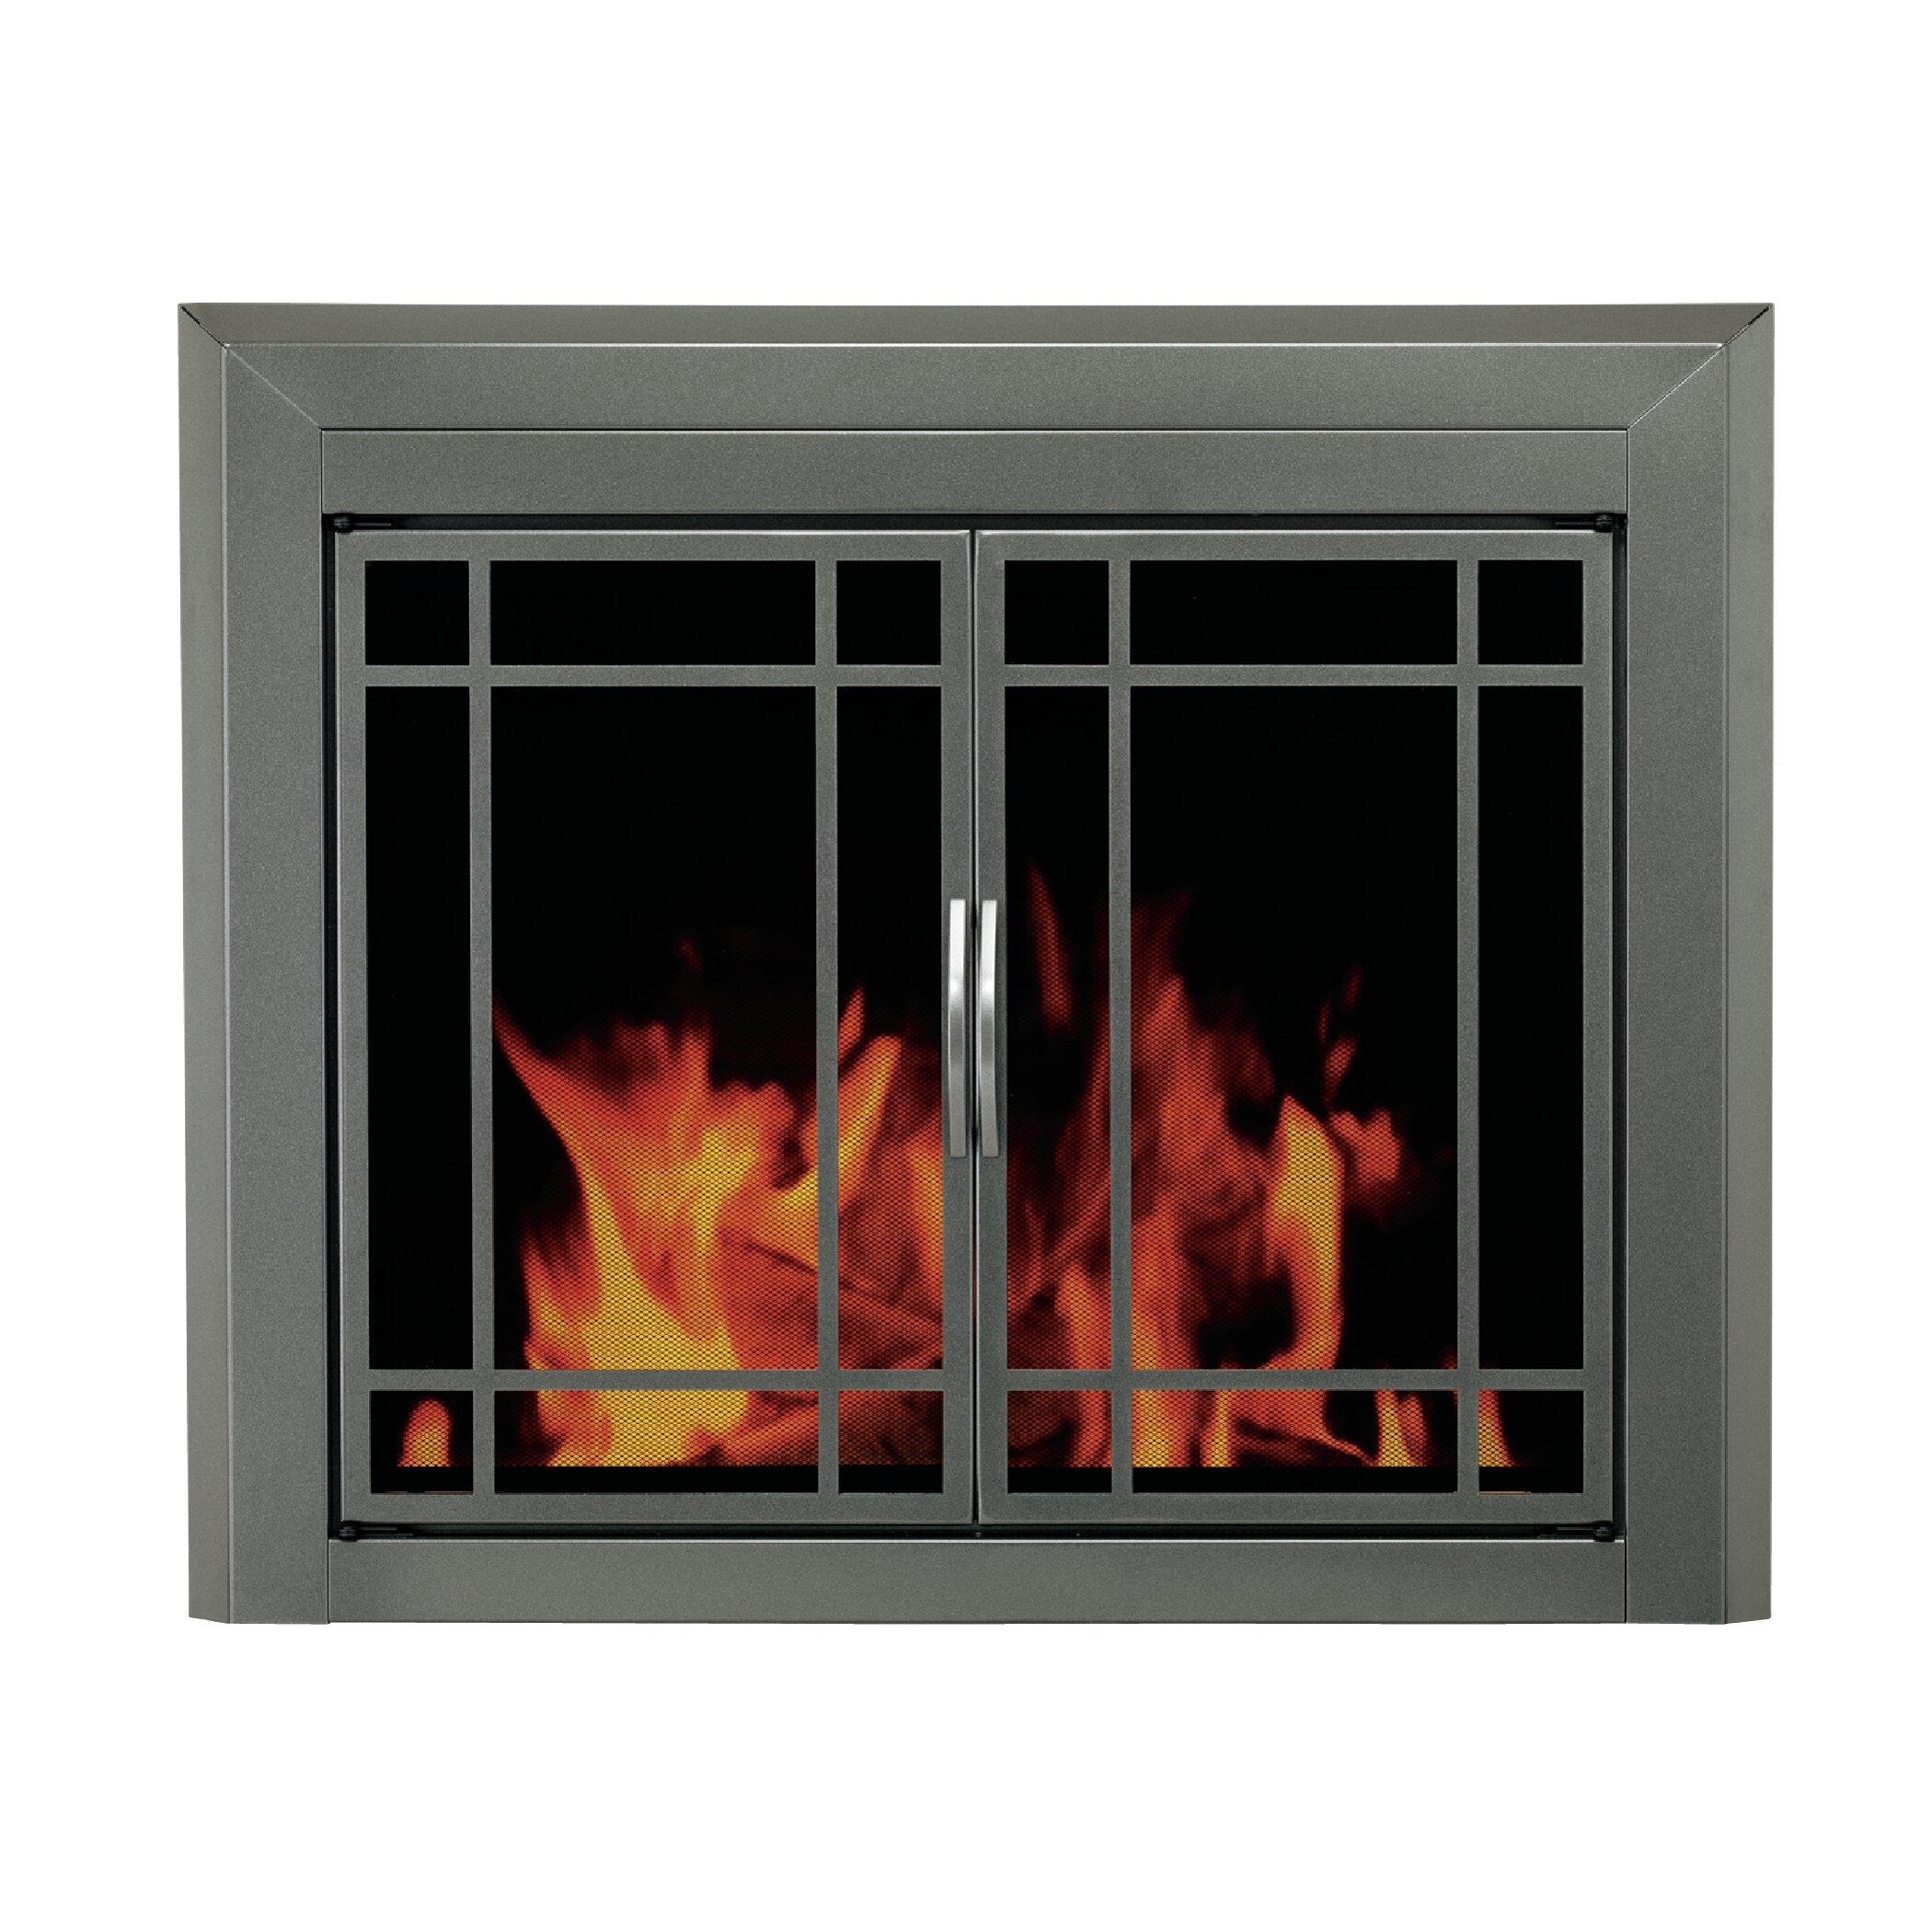 smoked glass doors examples ideas u0026 pictures megarct com just